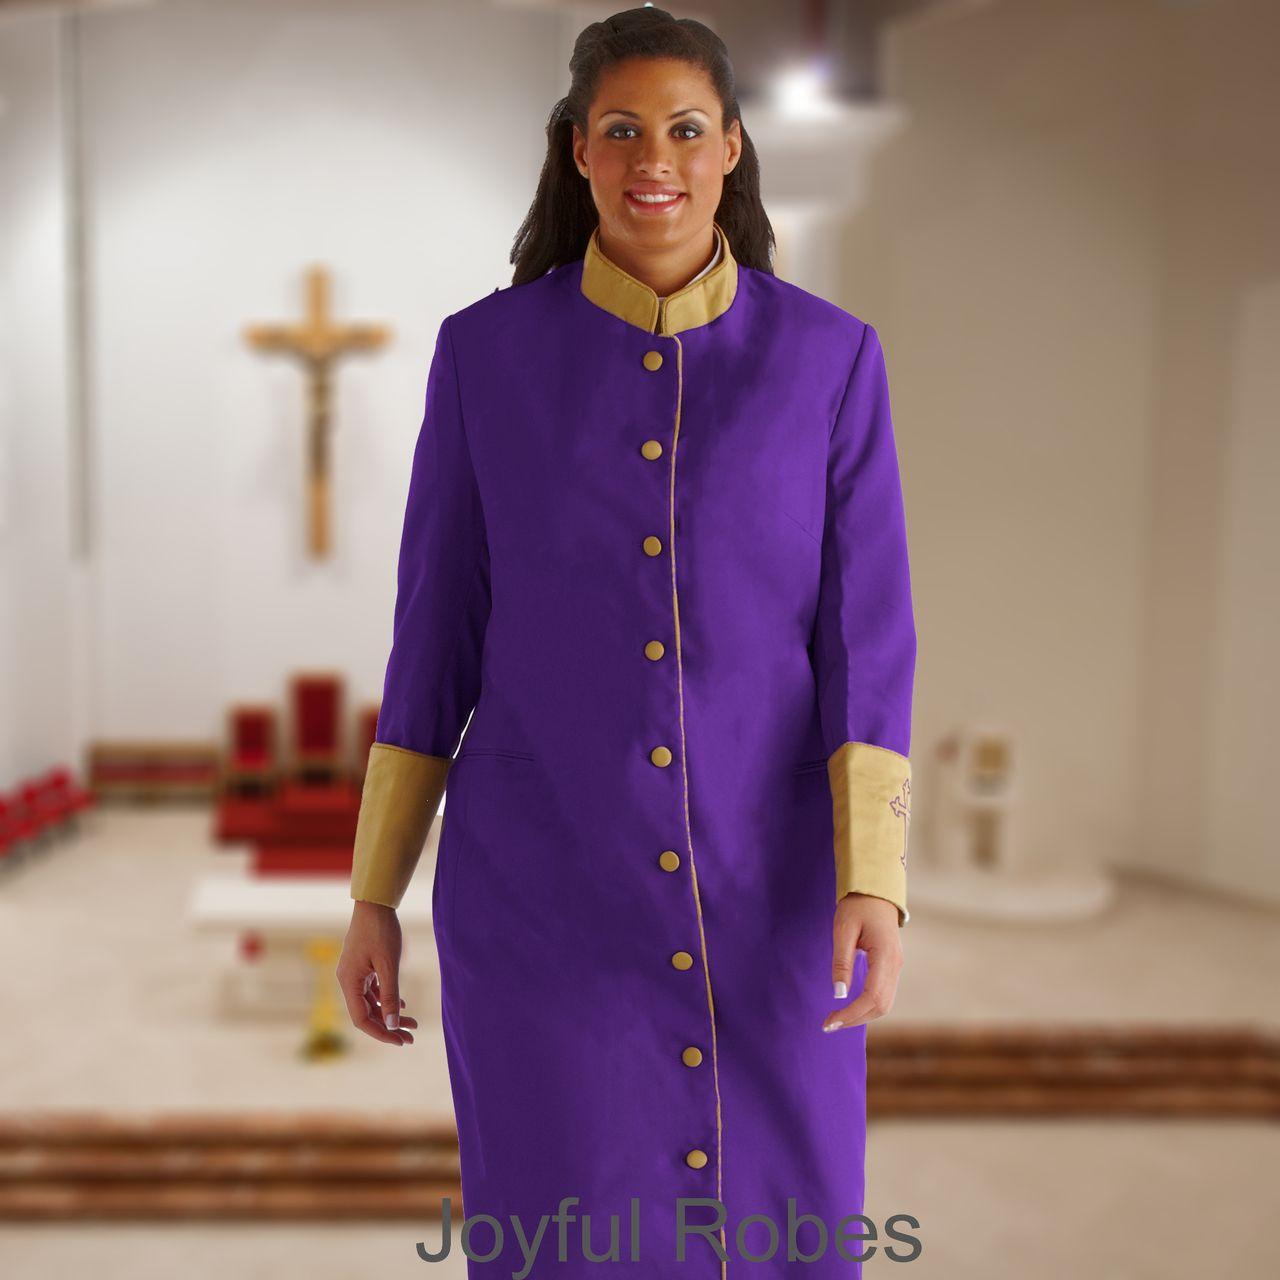 302 W. Women's Clergy/Pastor Robe Purple/Gold